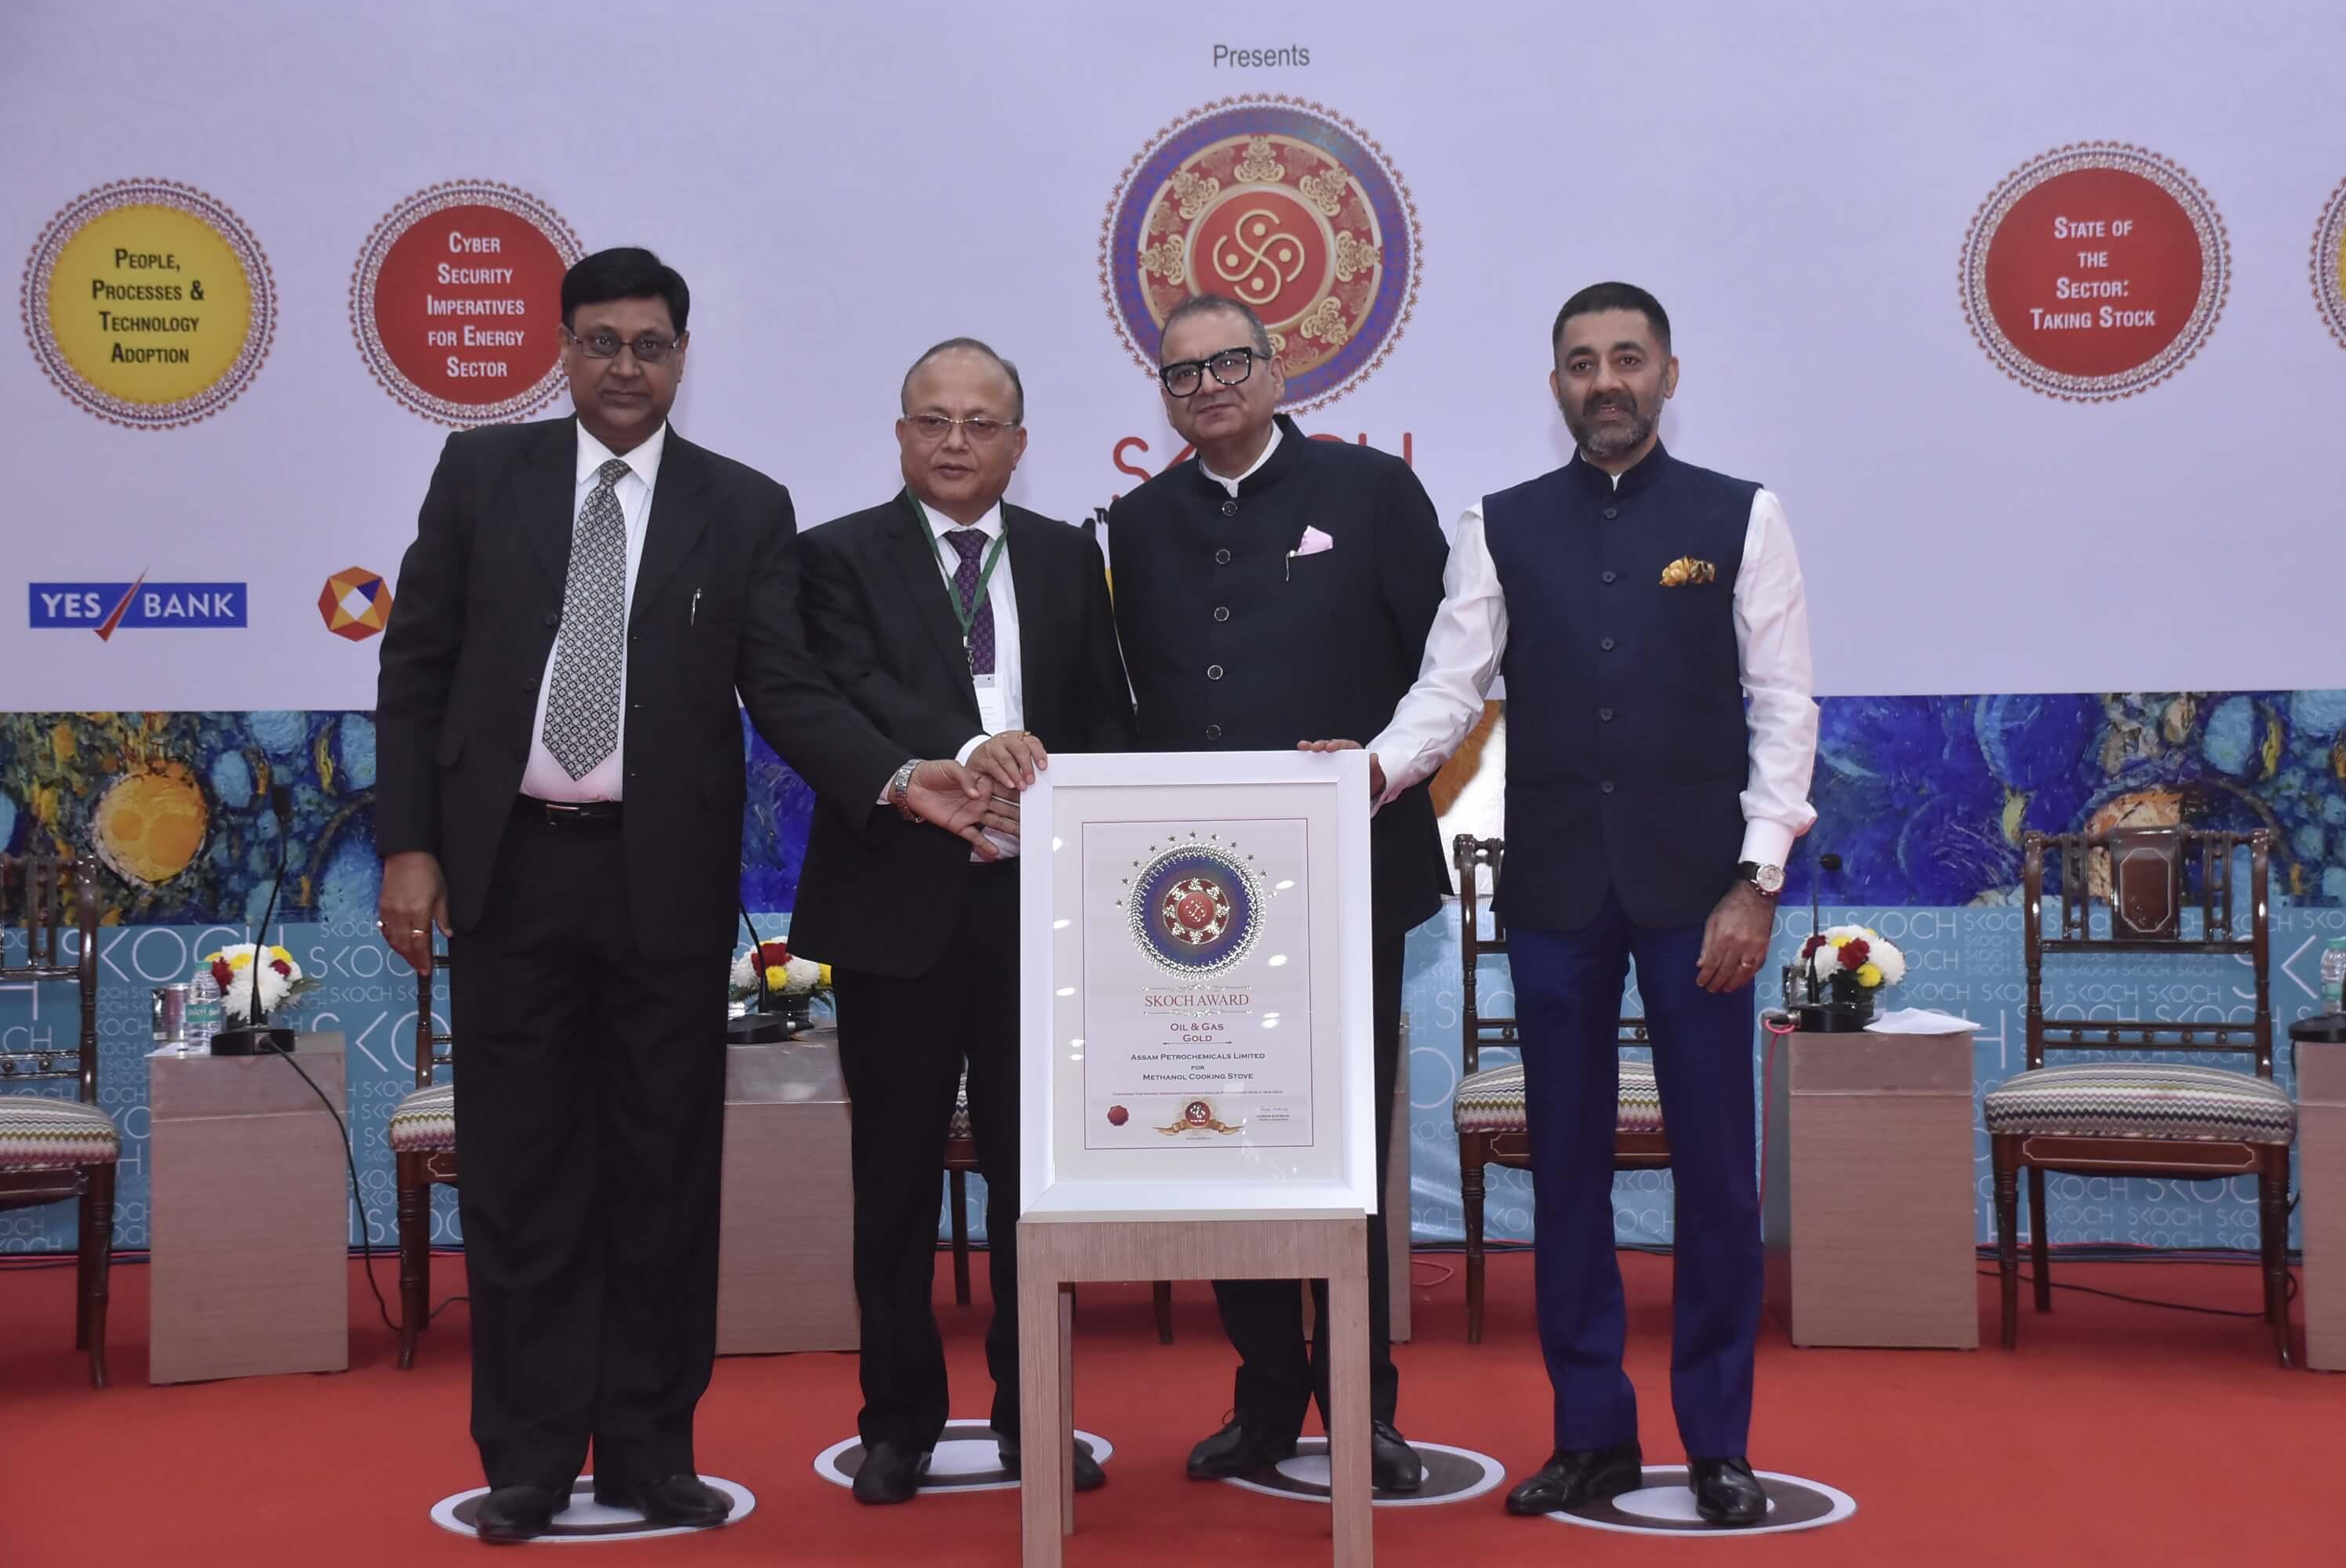 Assam Petro-chemicals Limited bags Skoch Gold Award